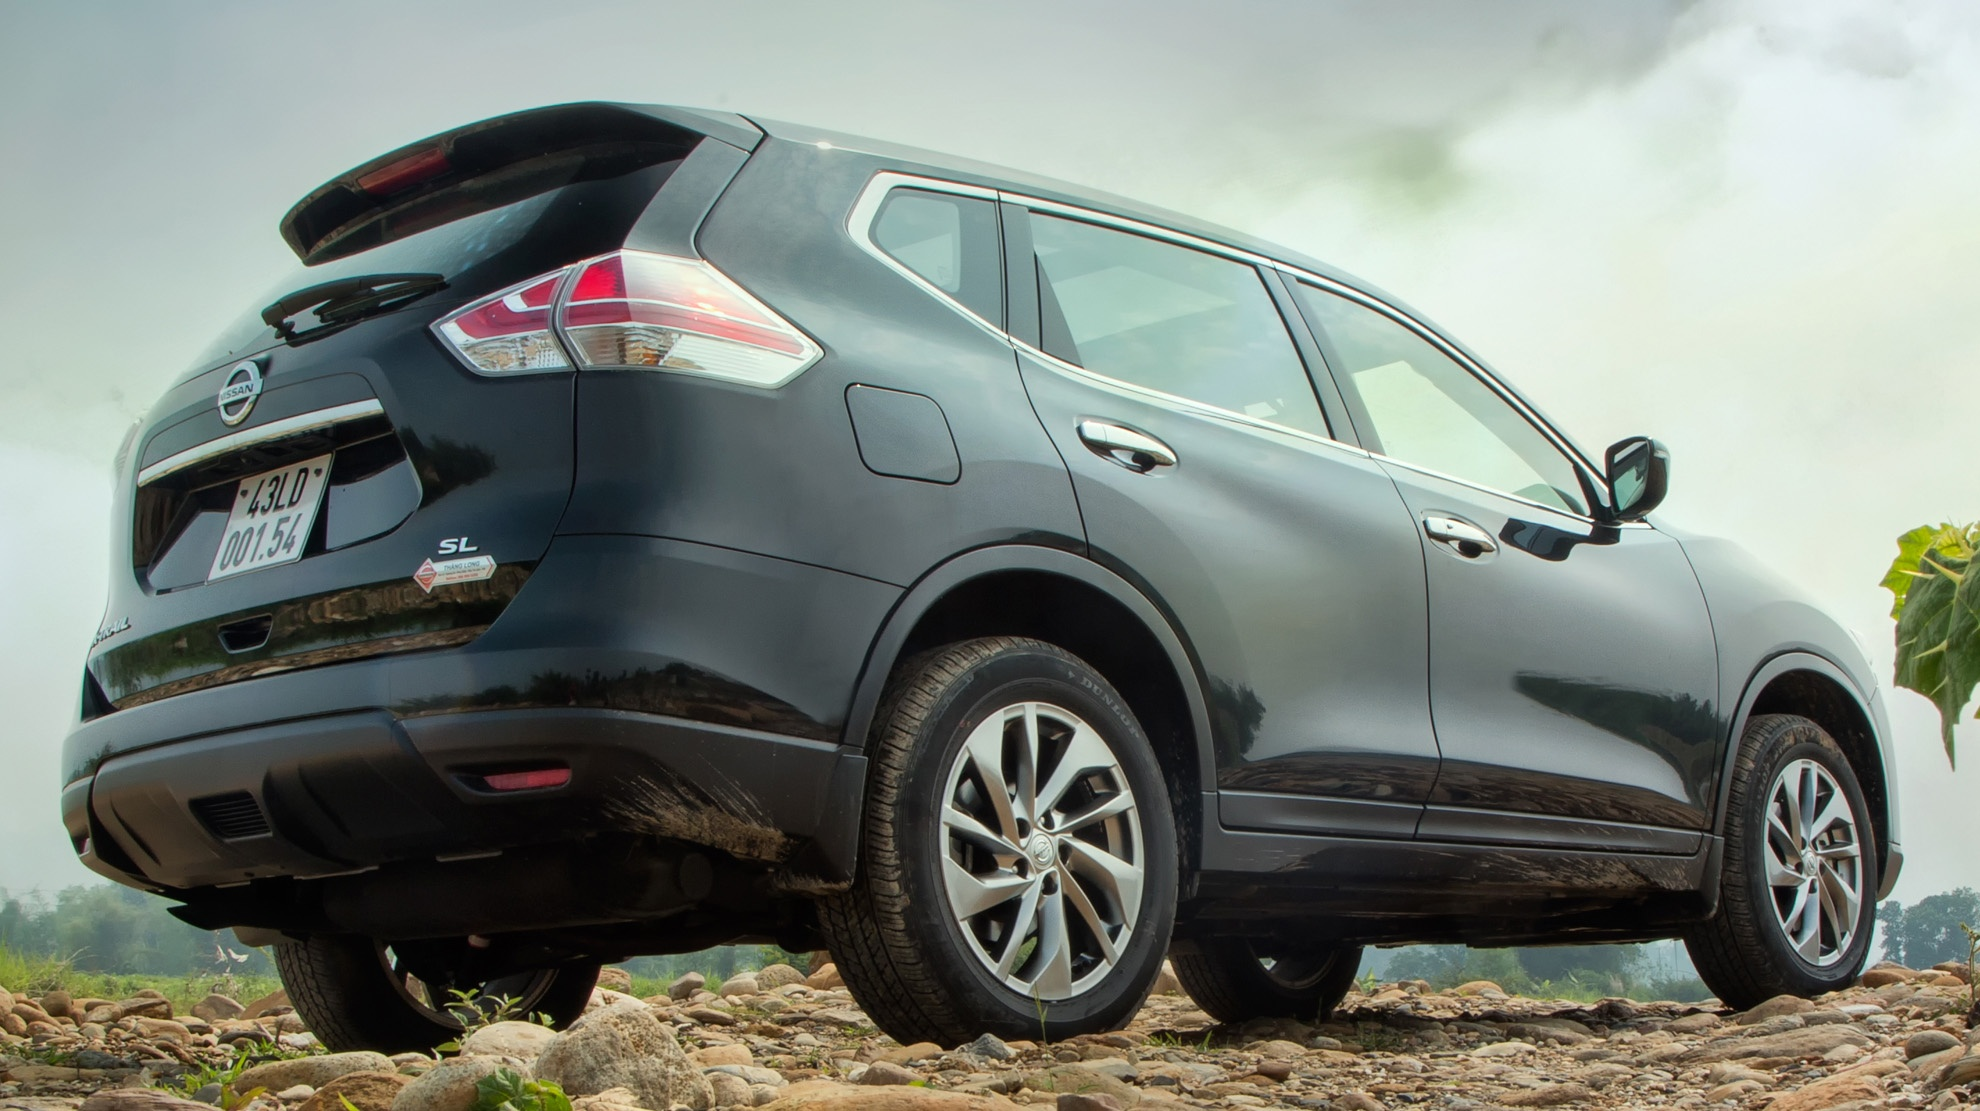 Danh gia Nissan X-Trail: Chay dua ve gia va cong nghe an toan hinh anh 6